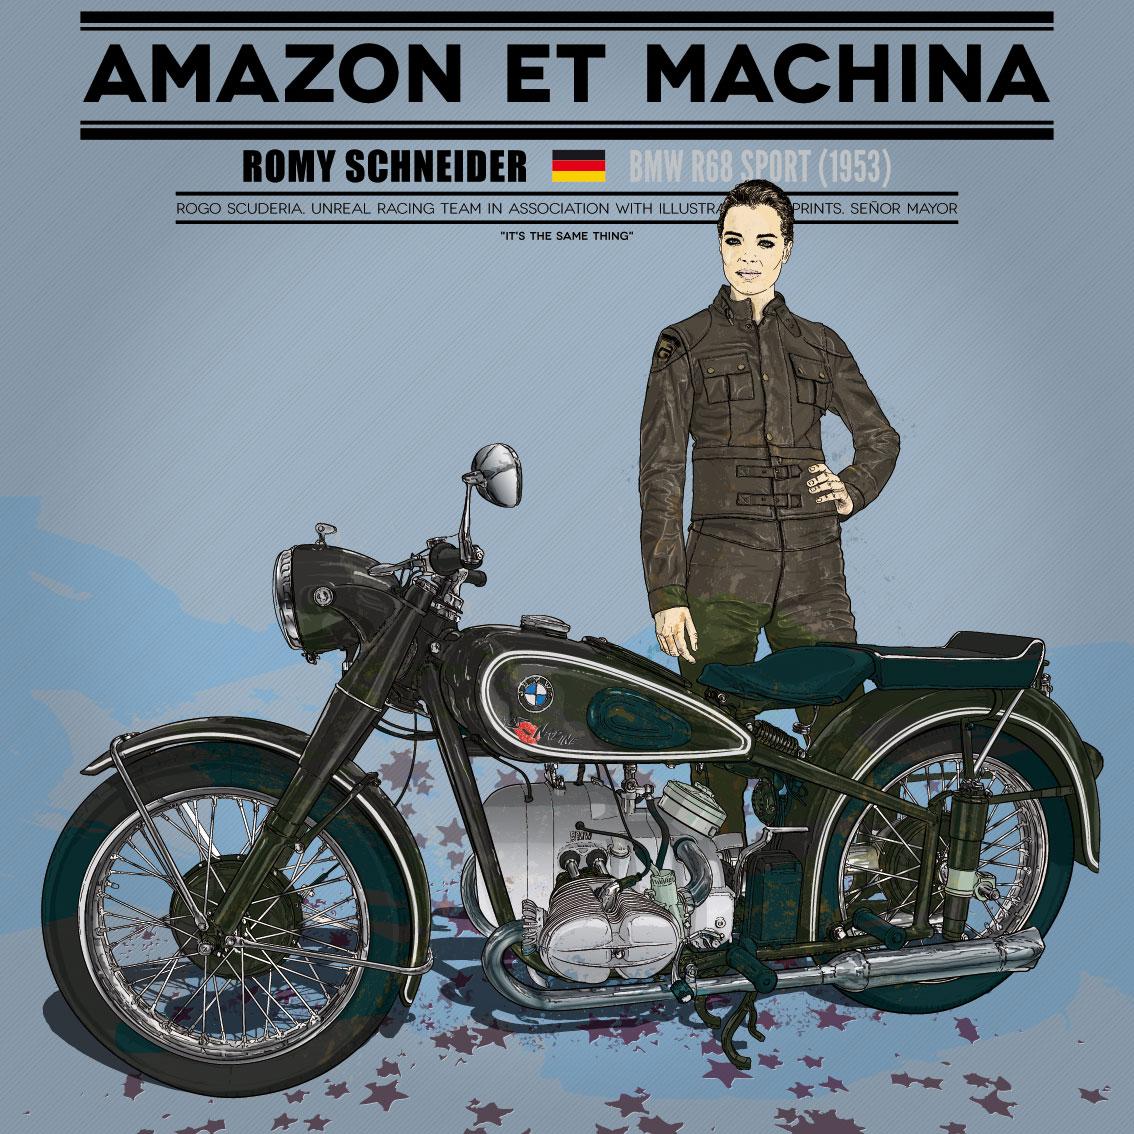 Romy y su BMW. Amazon et machina